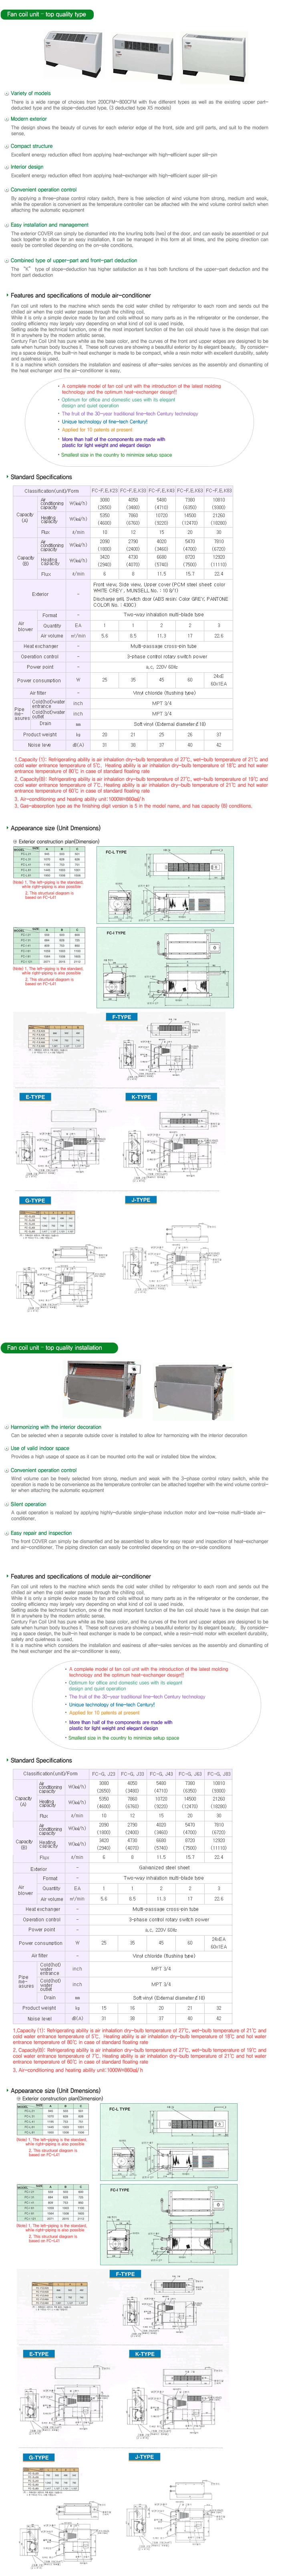 CENTURY Fan Coil Unit - Top quality type FC-Series